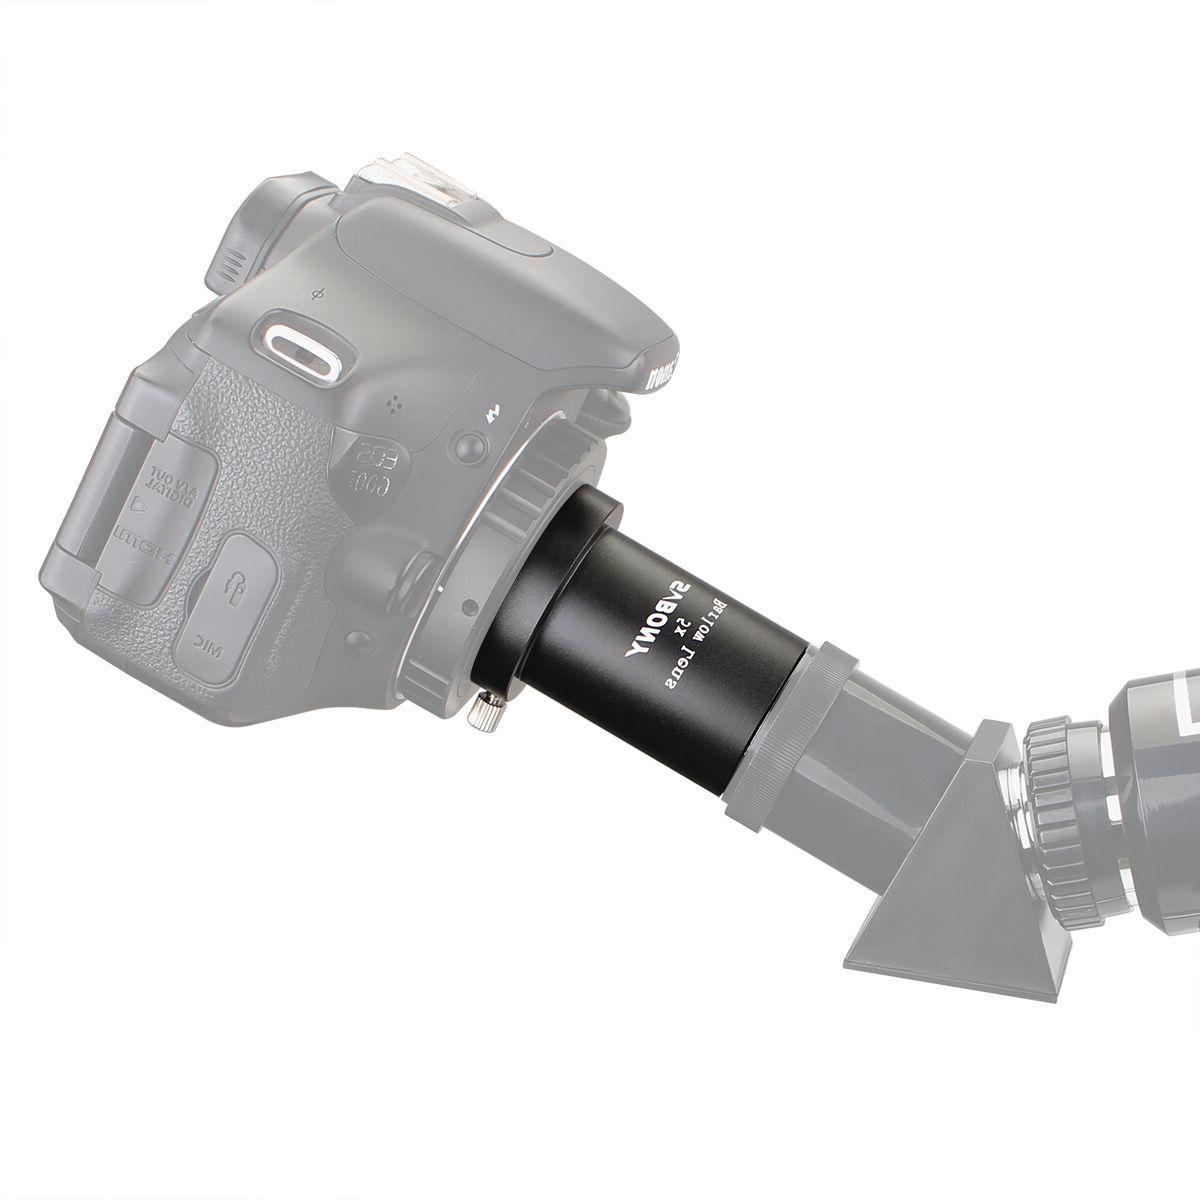 "SVbony Barlow 1.25""31.7mm for Telescope"